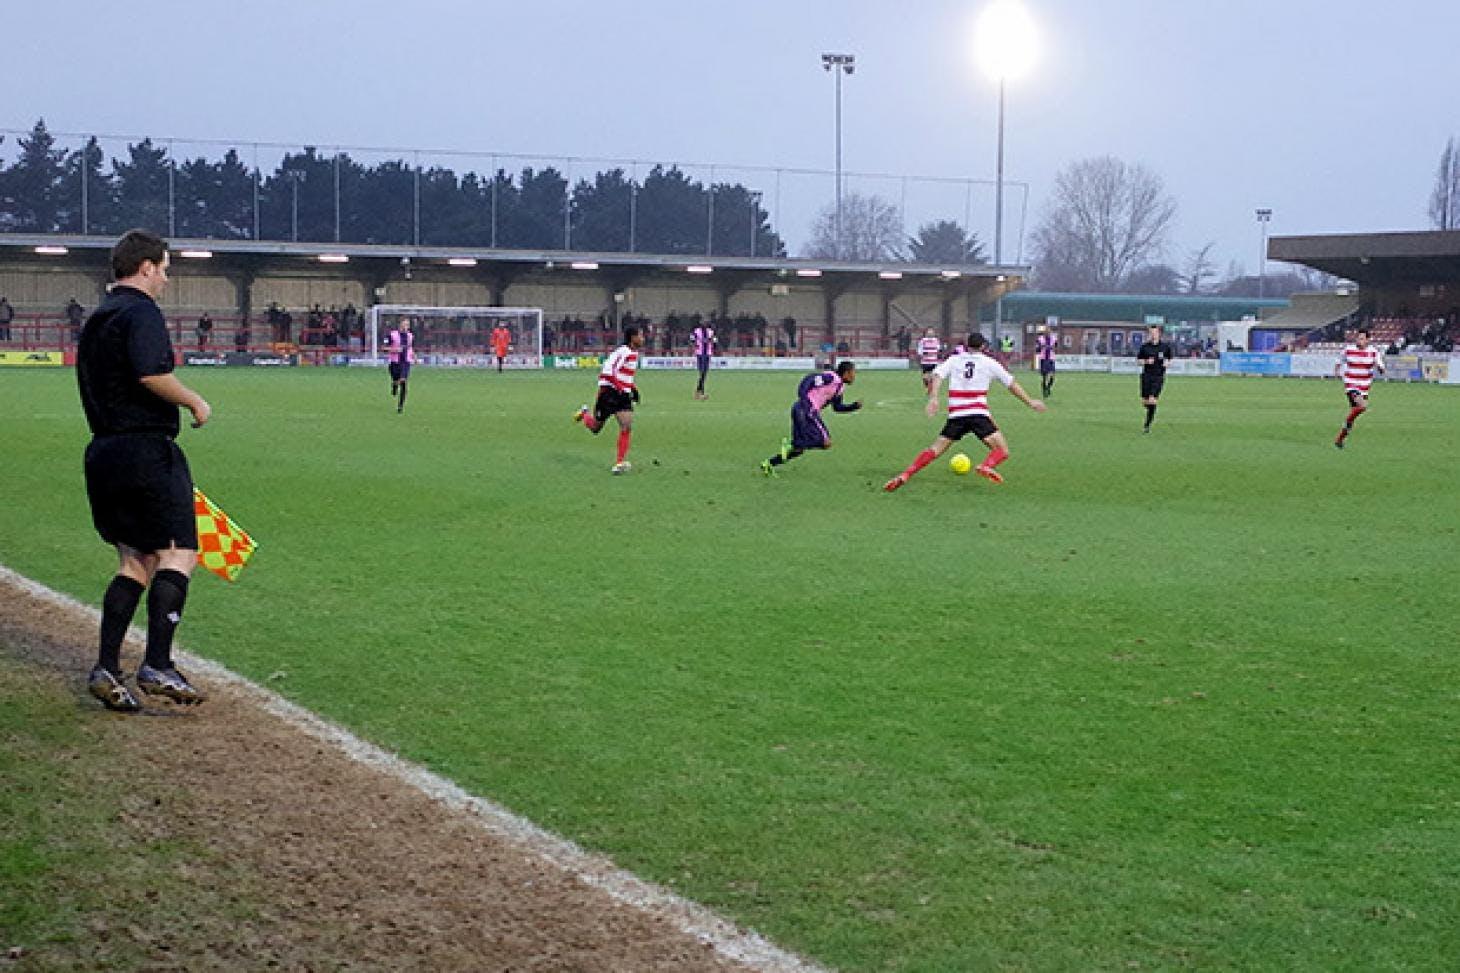 Dulwich Sports Ground 5 a side | Grass football pitch